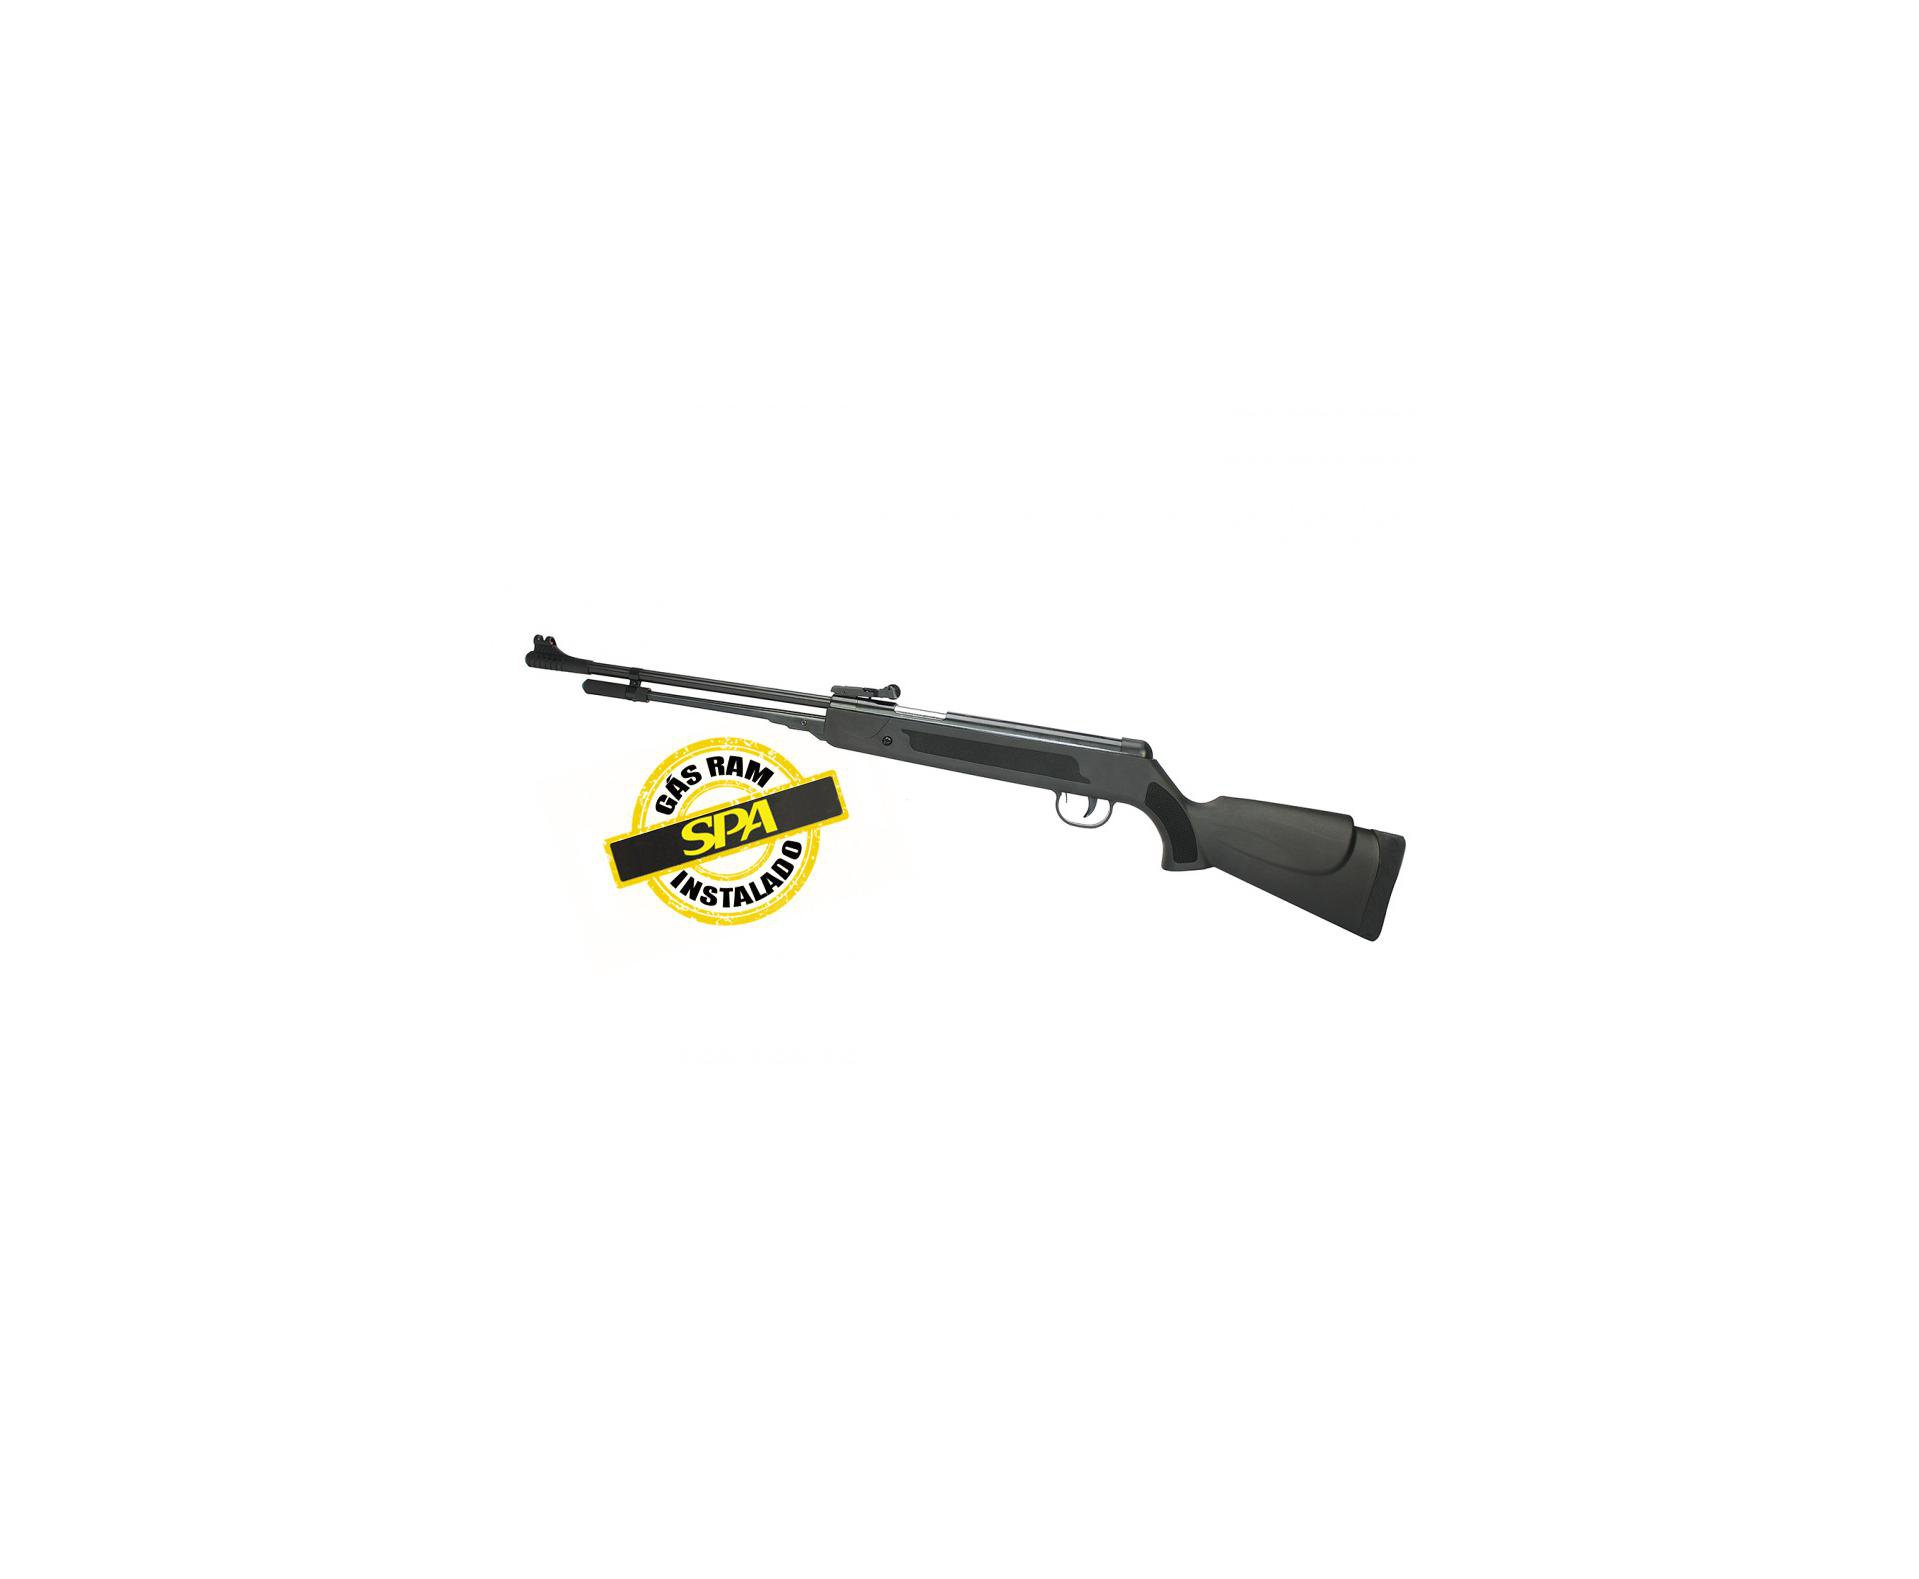 Carabina De Pressão Black Nitro Power Cal 5,5 Gas Ram 50kg Spa Instalado Fxr Fixxar